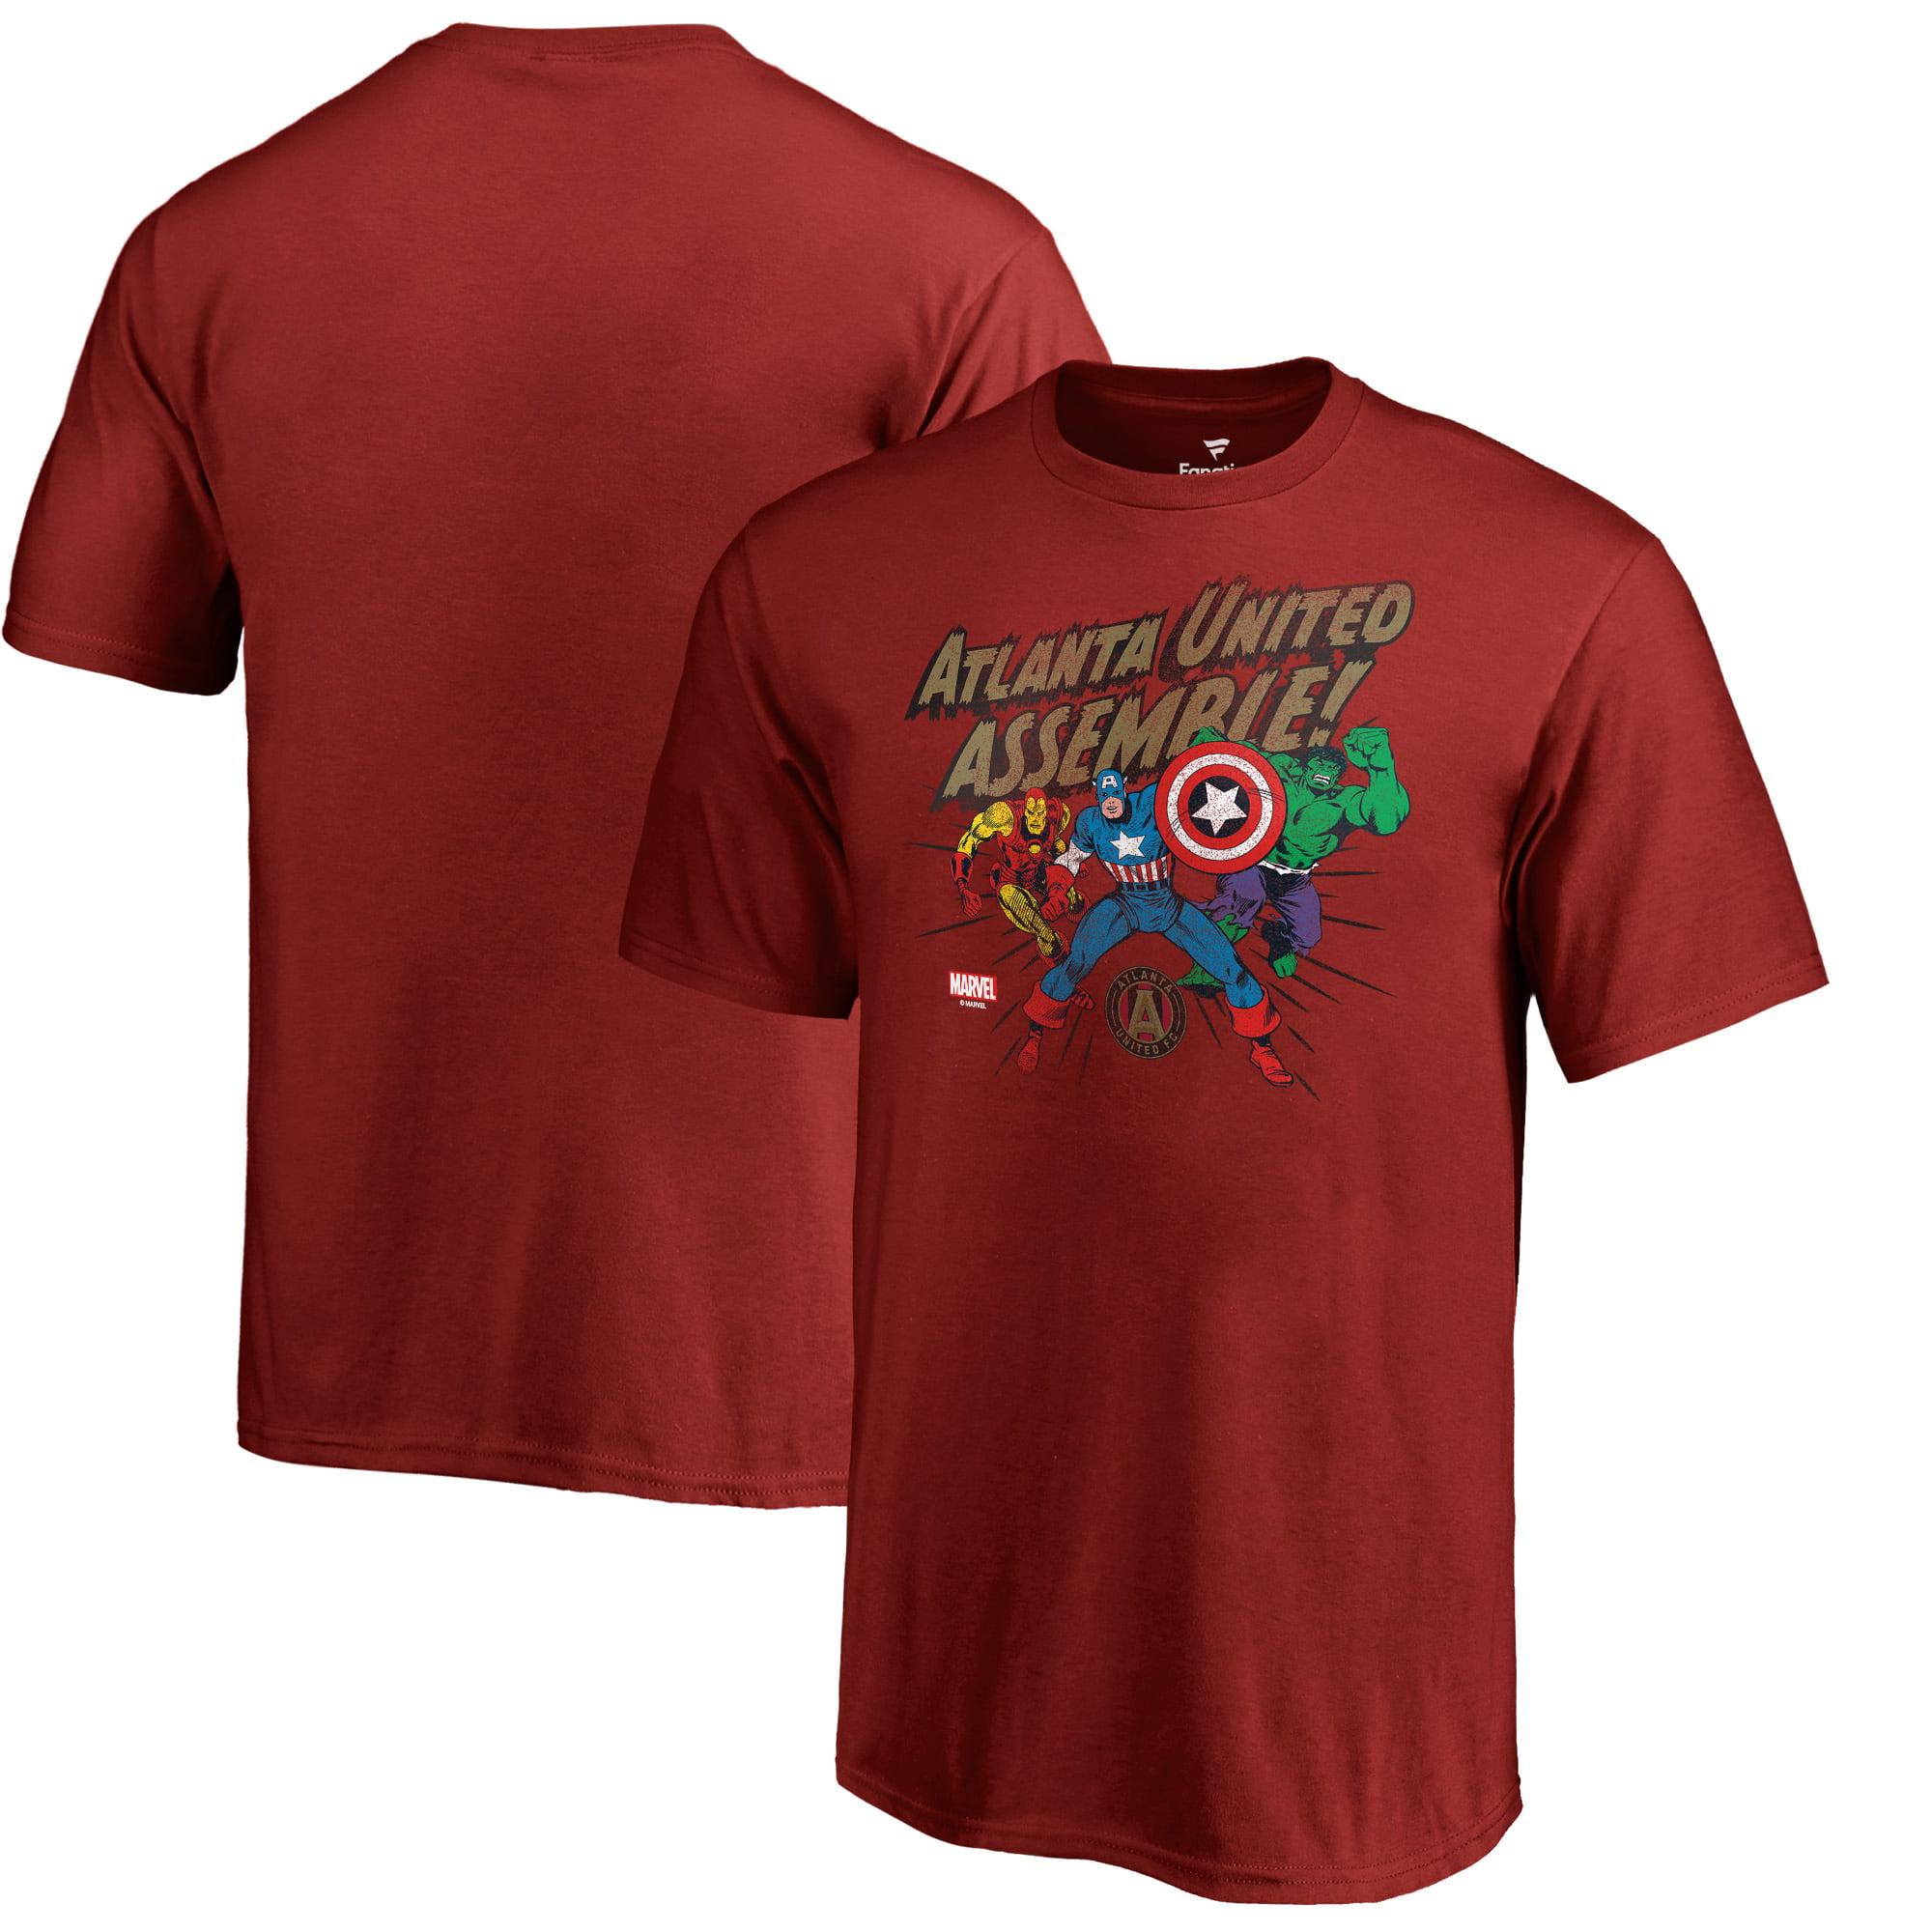 Atlanta United FC Fanatics Branded Youth Marvel Avengers Assemble T-Shirt - Cardinal